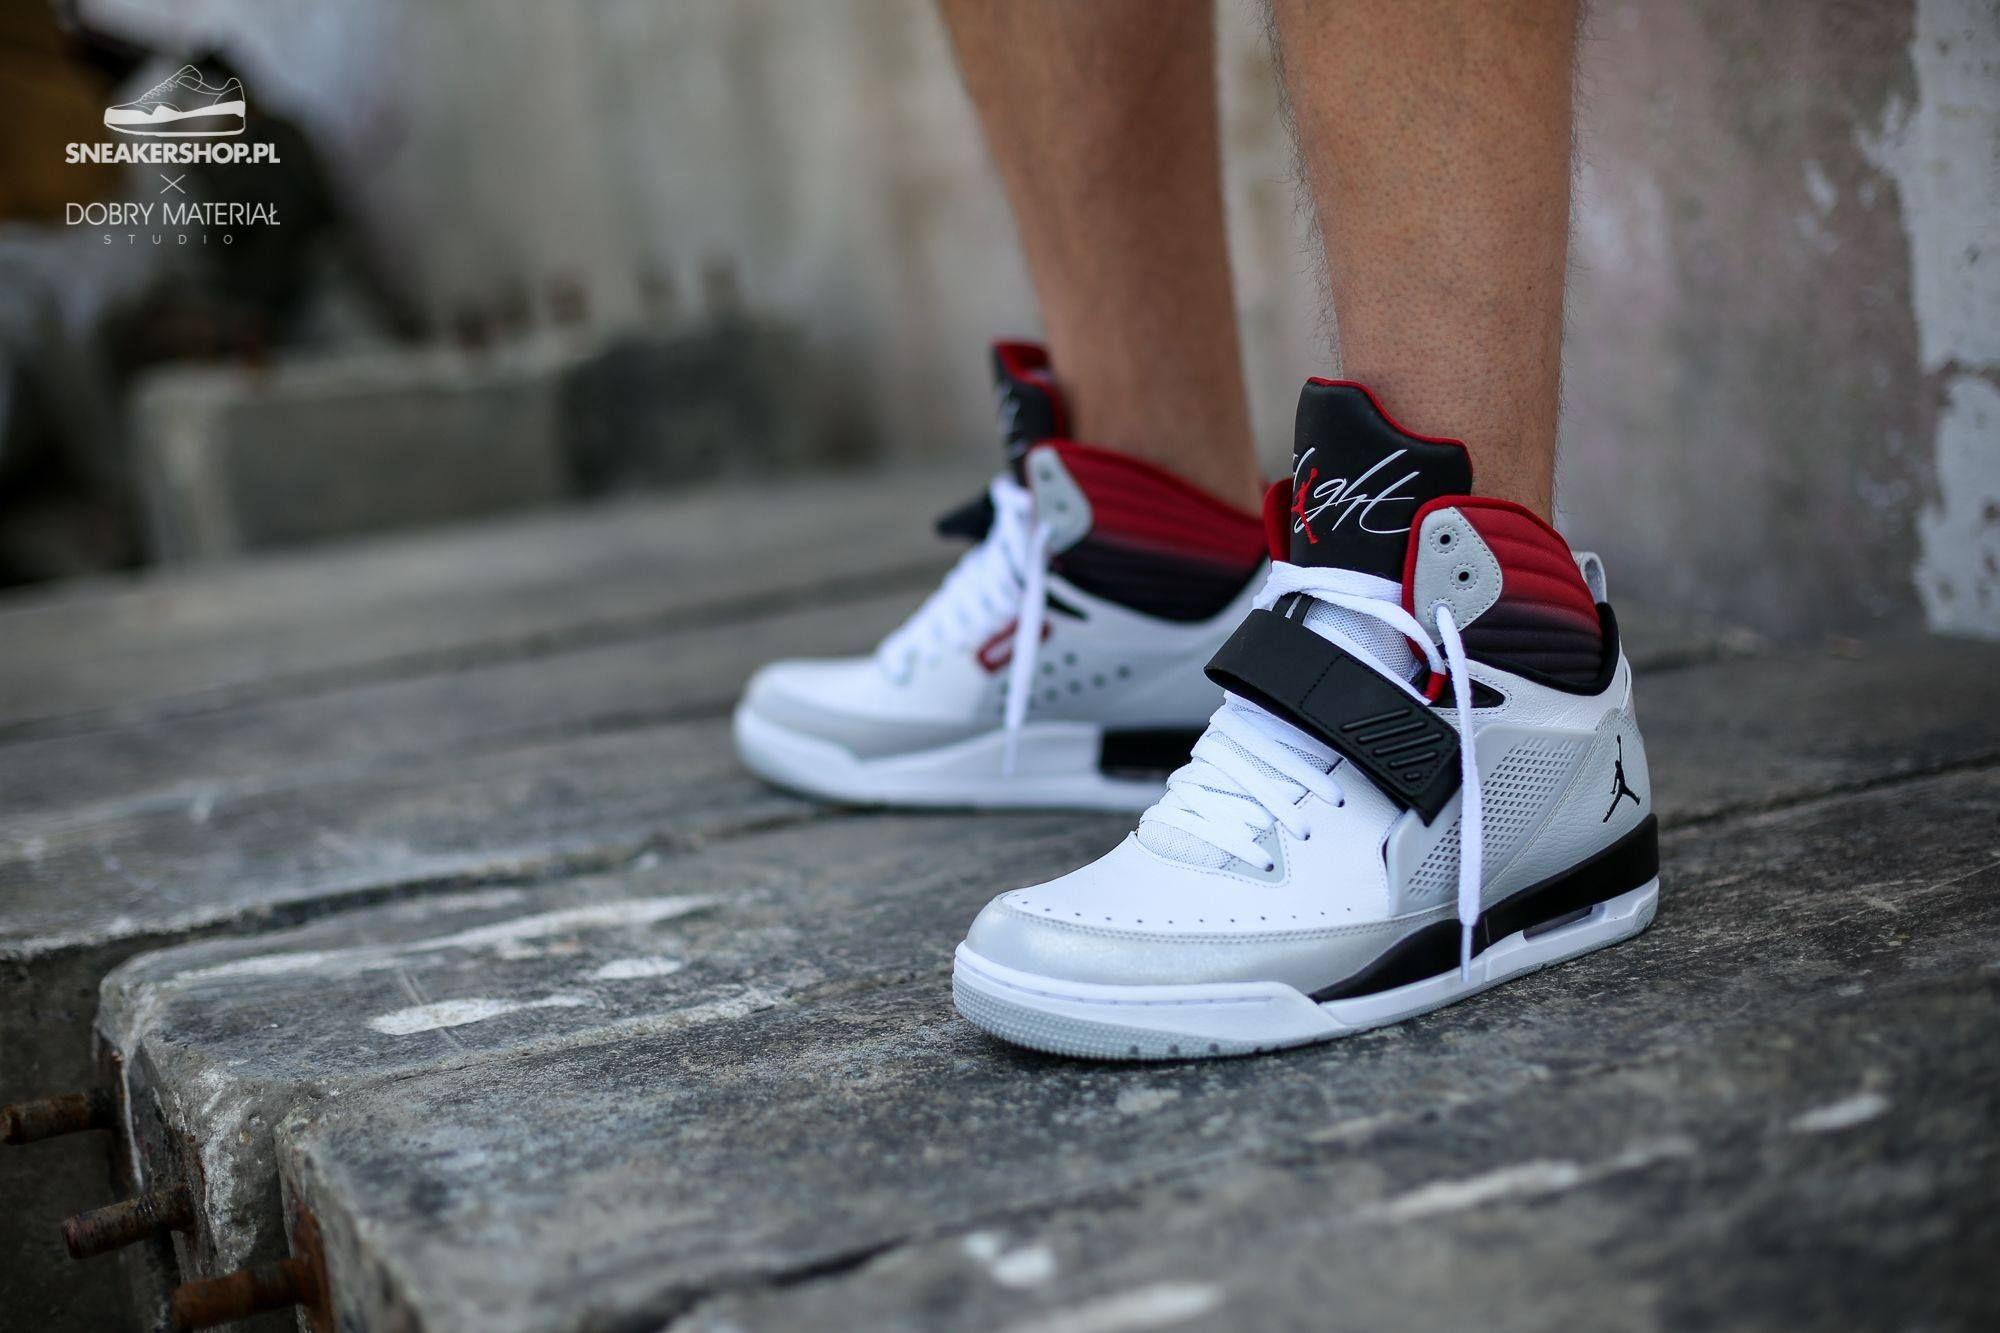 Jordan Flight 97 White/Black/Pure Platinum 654265 104